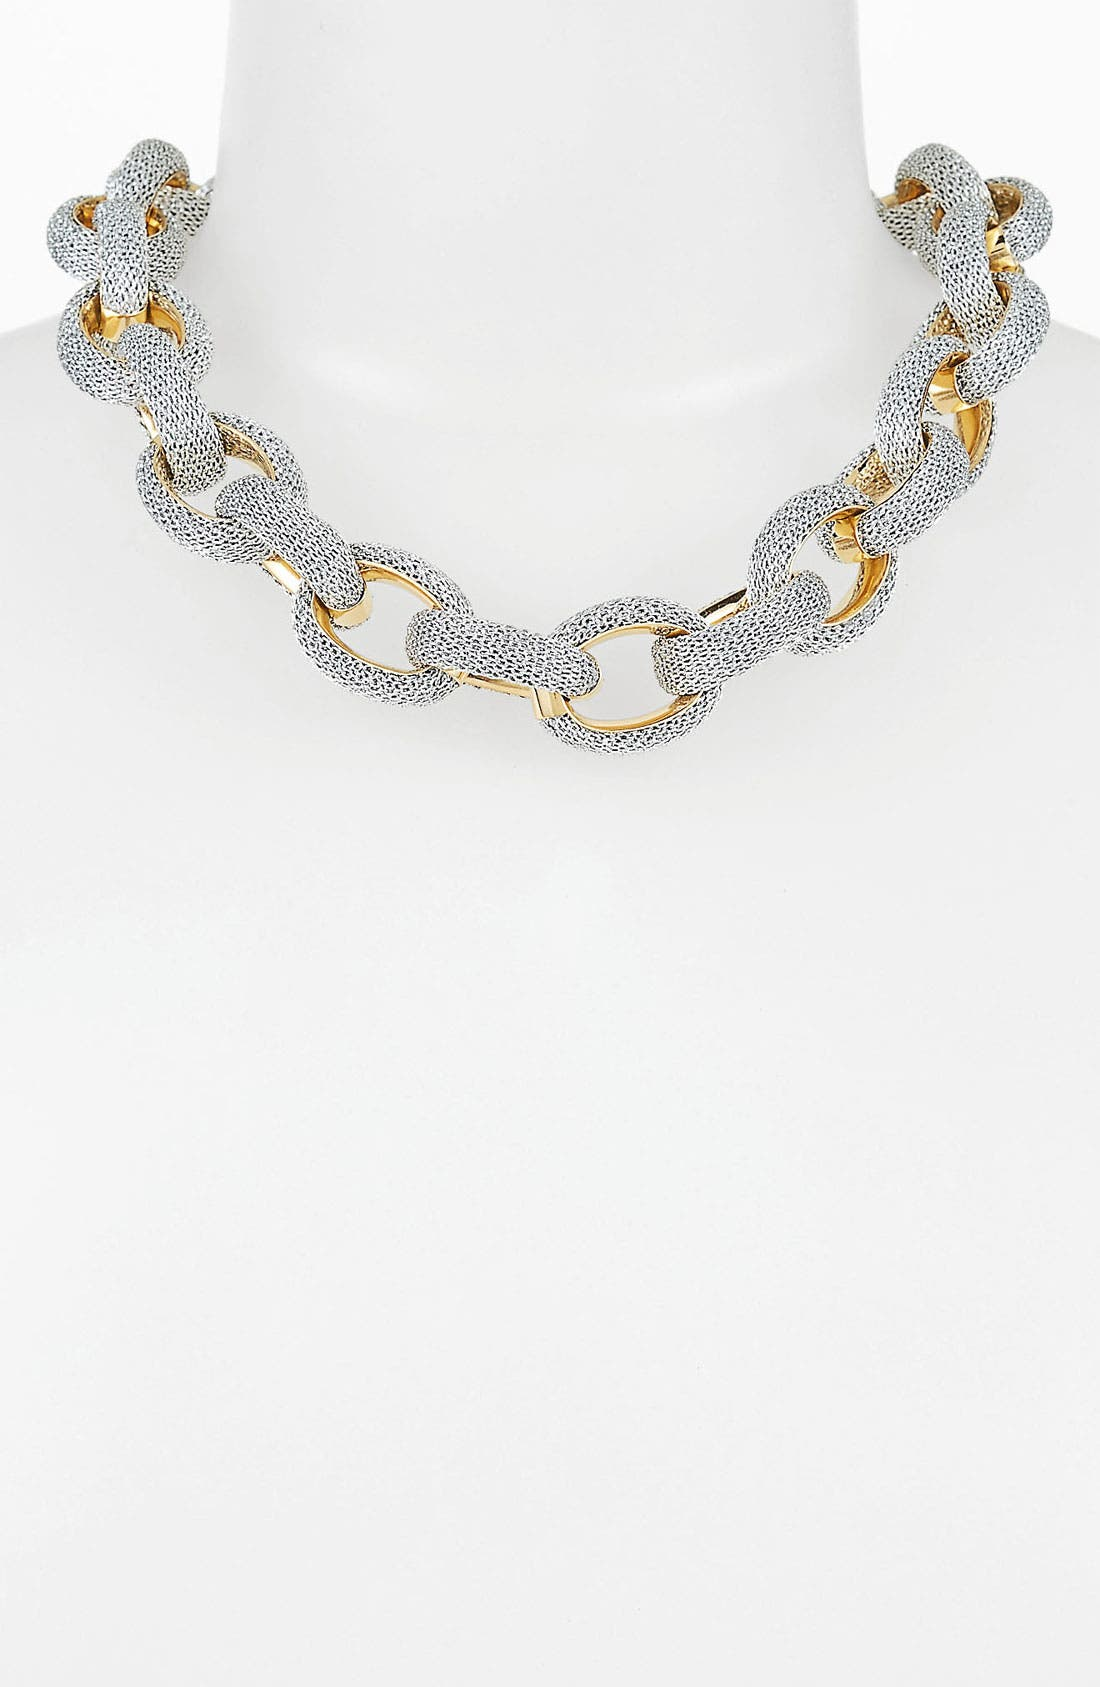 Alternate Image 1 Selected - Adami & Martucci 'Mesh' Link Collar Necklace (Nordstrom Exclusive)